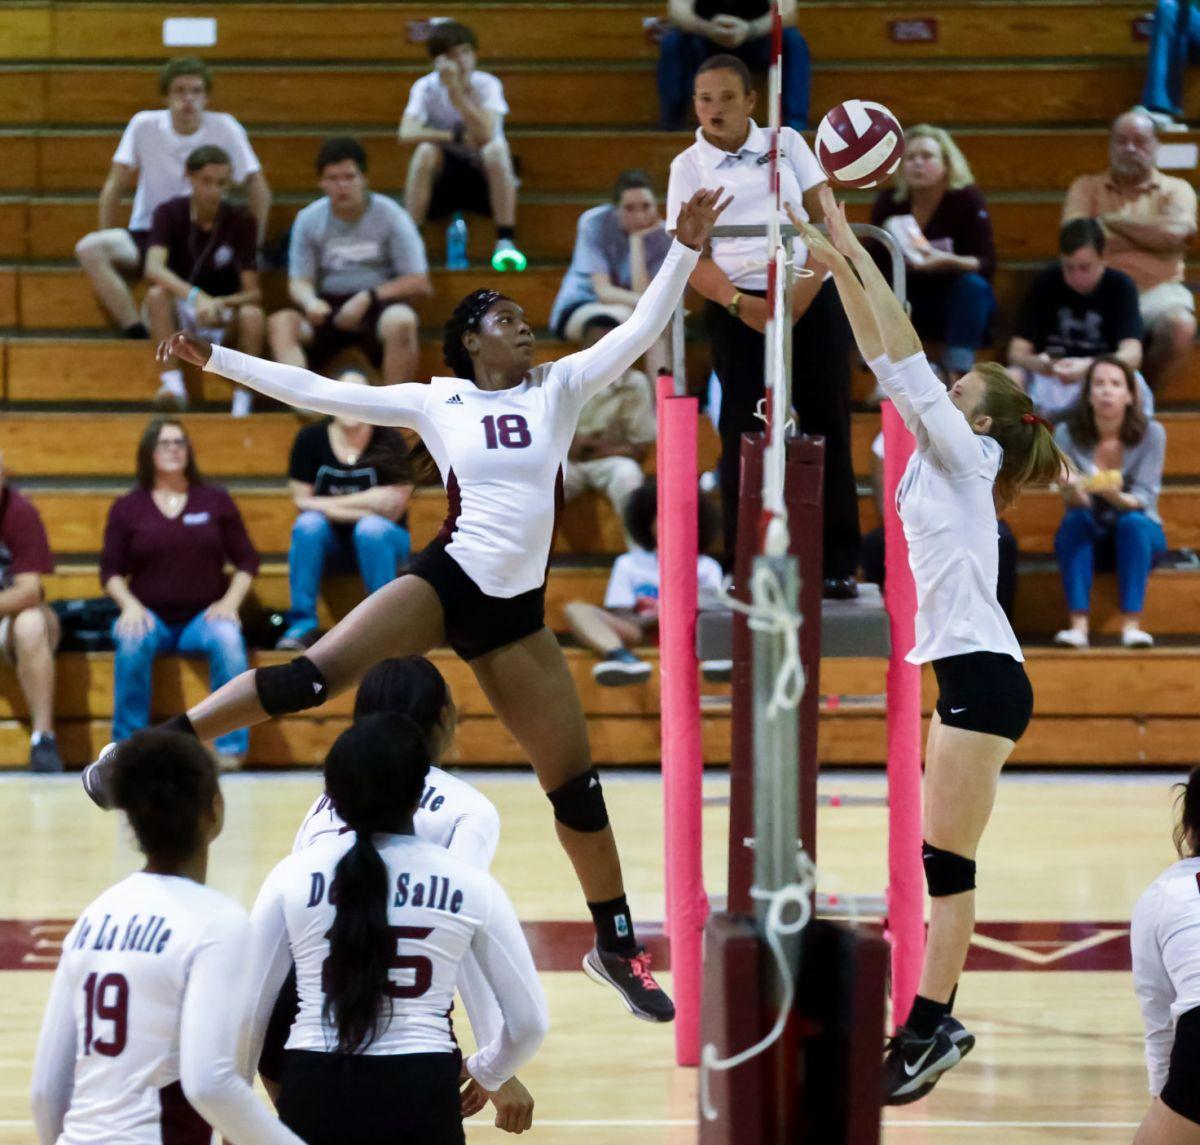 De La Salle volleyball team advances in playoffs with 3-0 ...